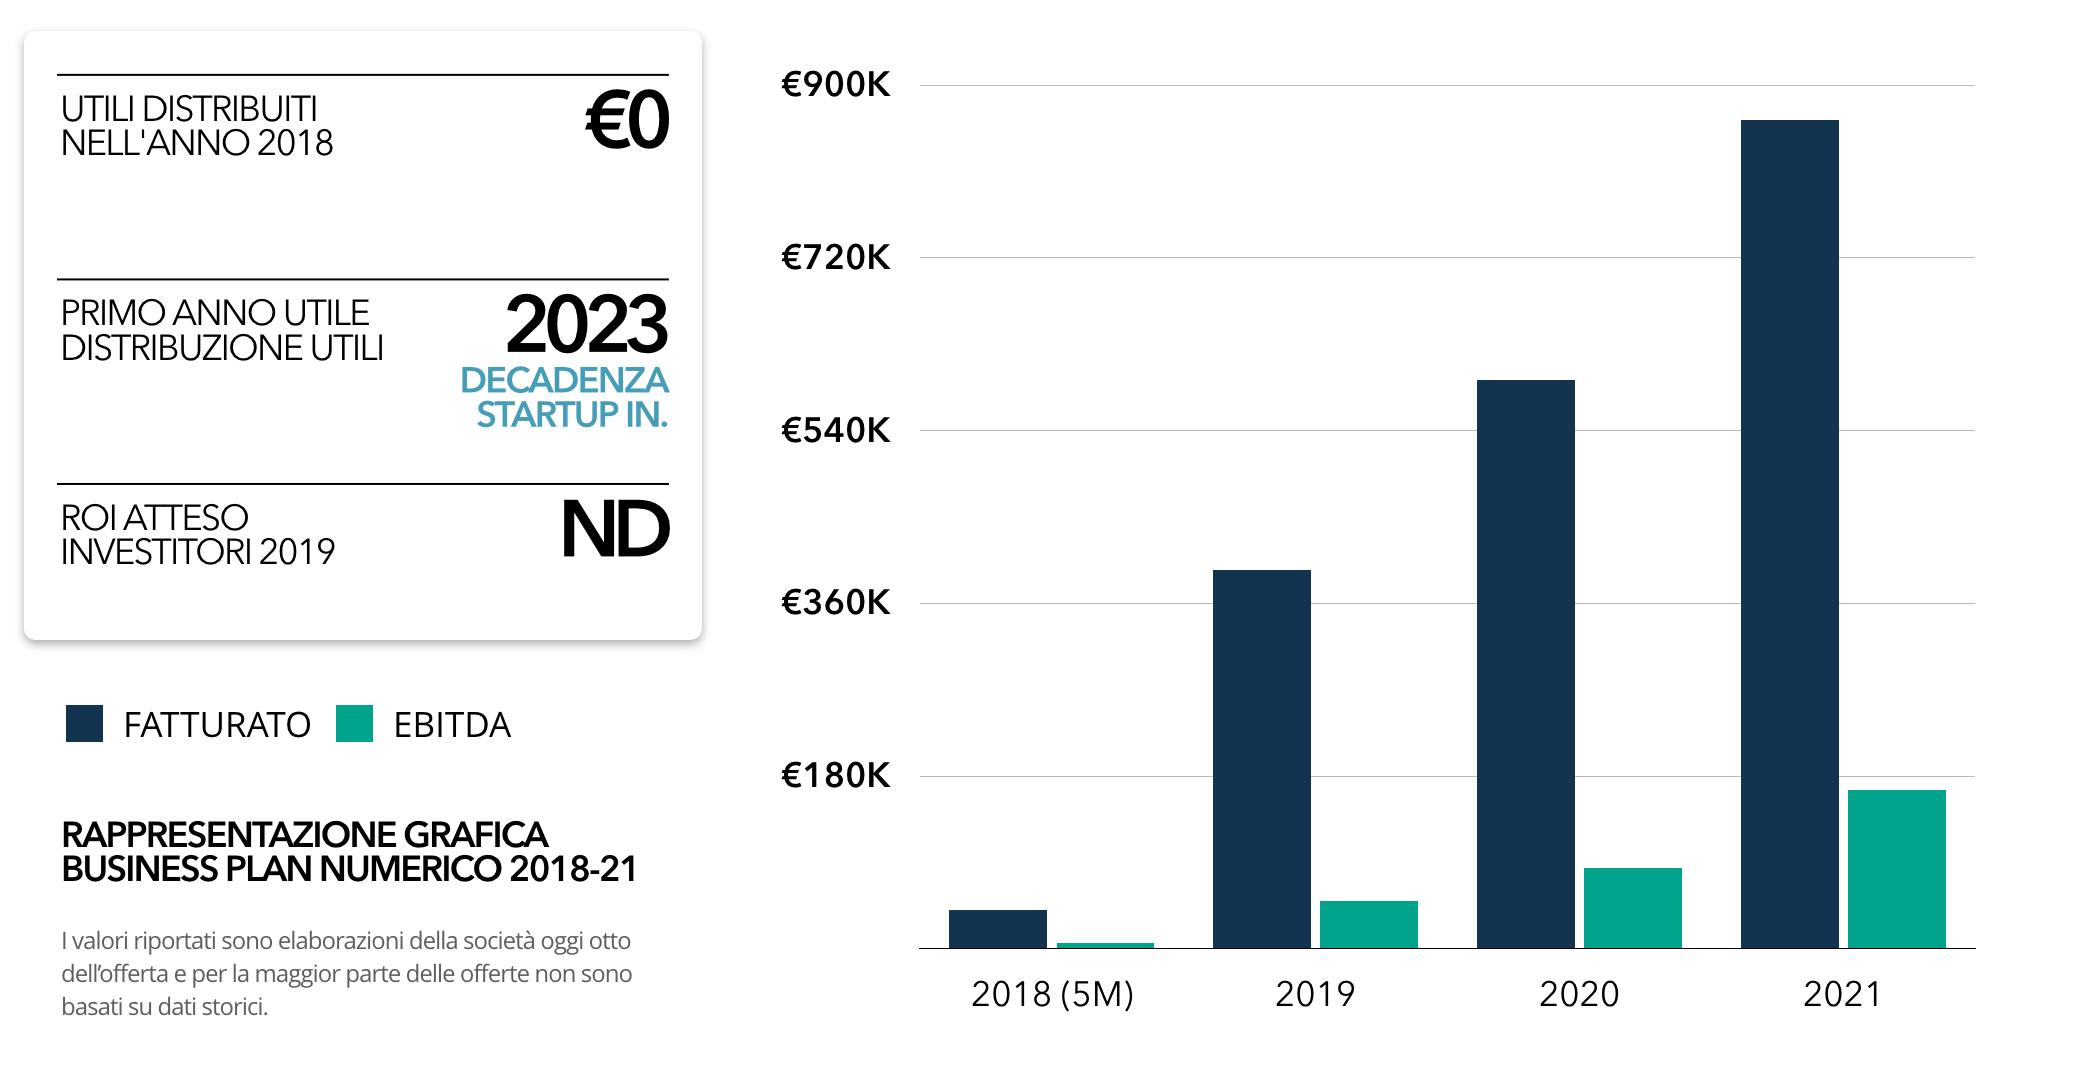 Salvassistance-crowdfunding-equity-colosseo-roma-turismo